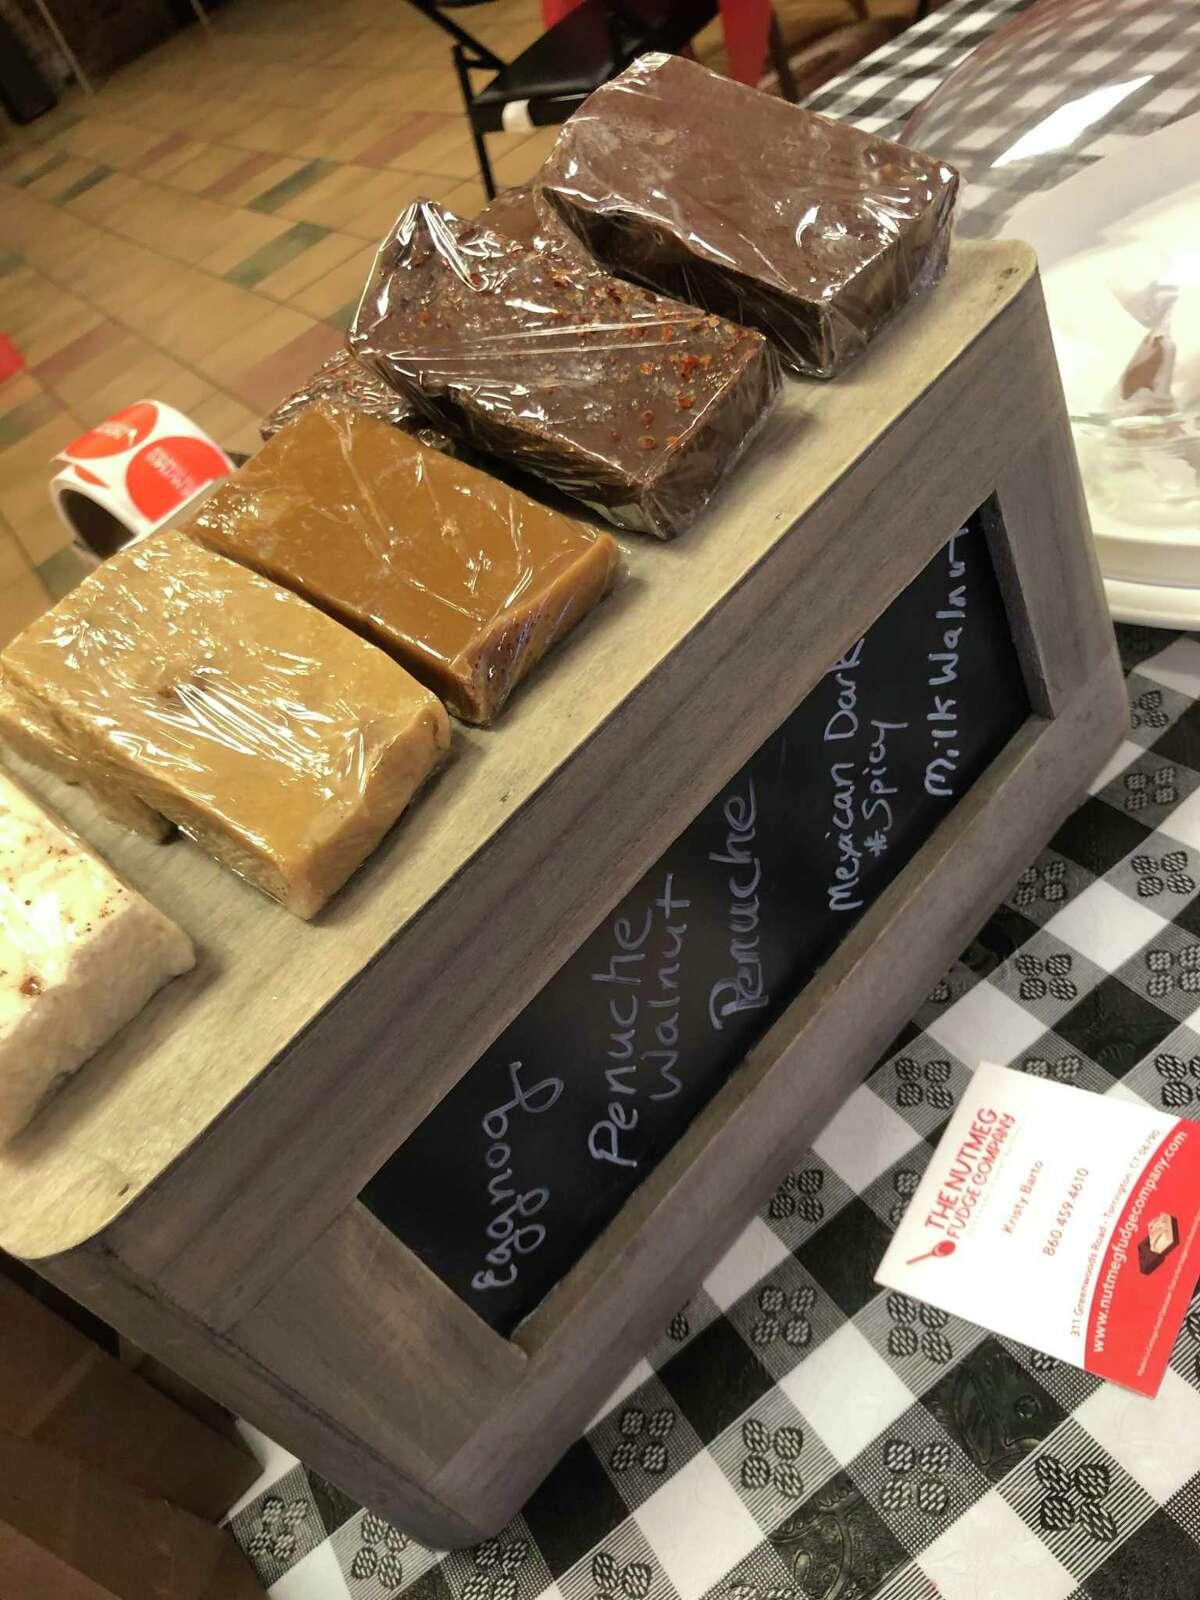 Some of Kristy Barto's homemade fudge